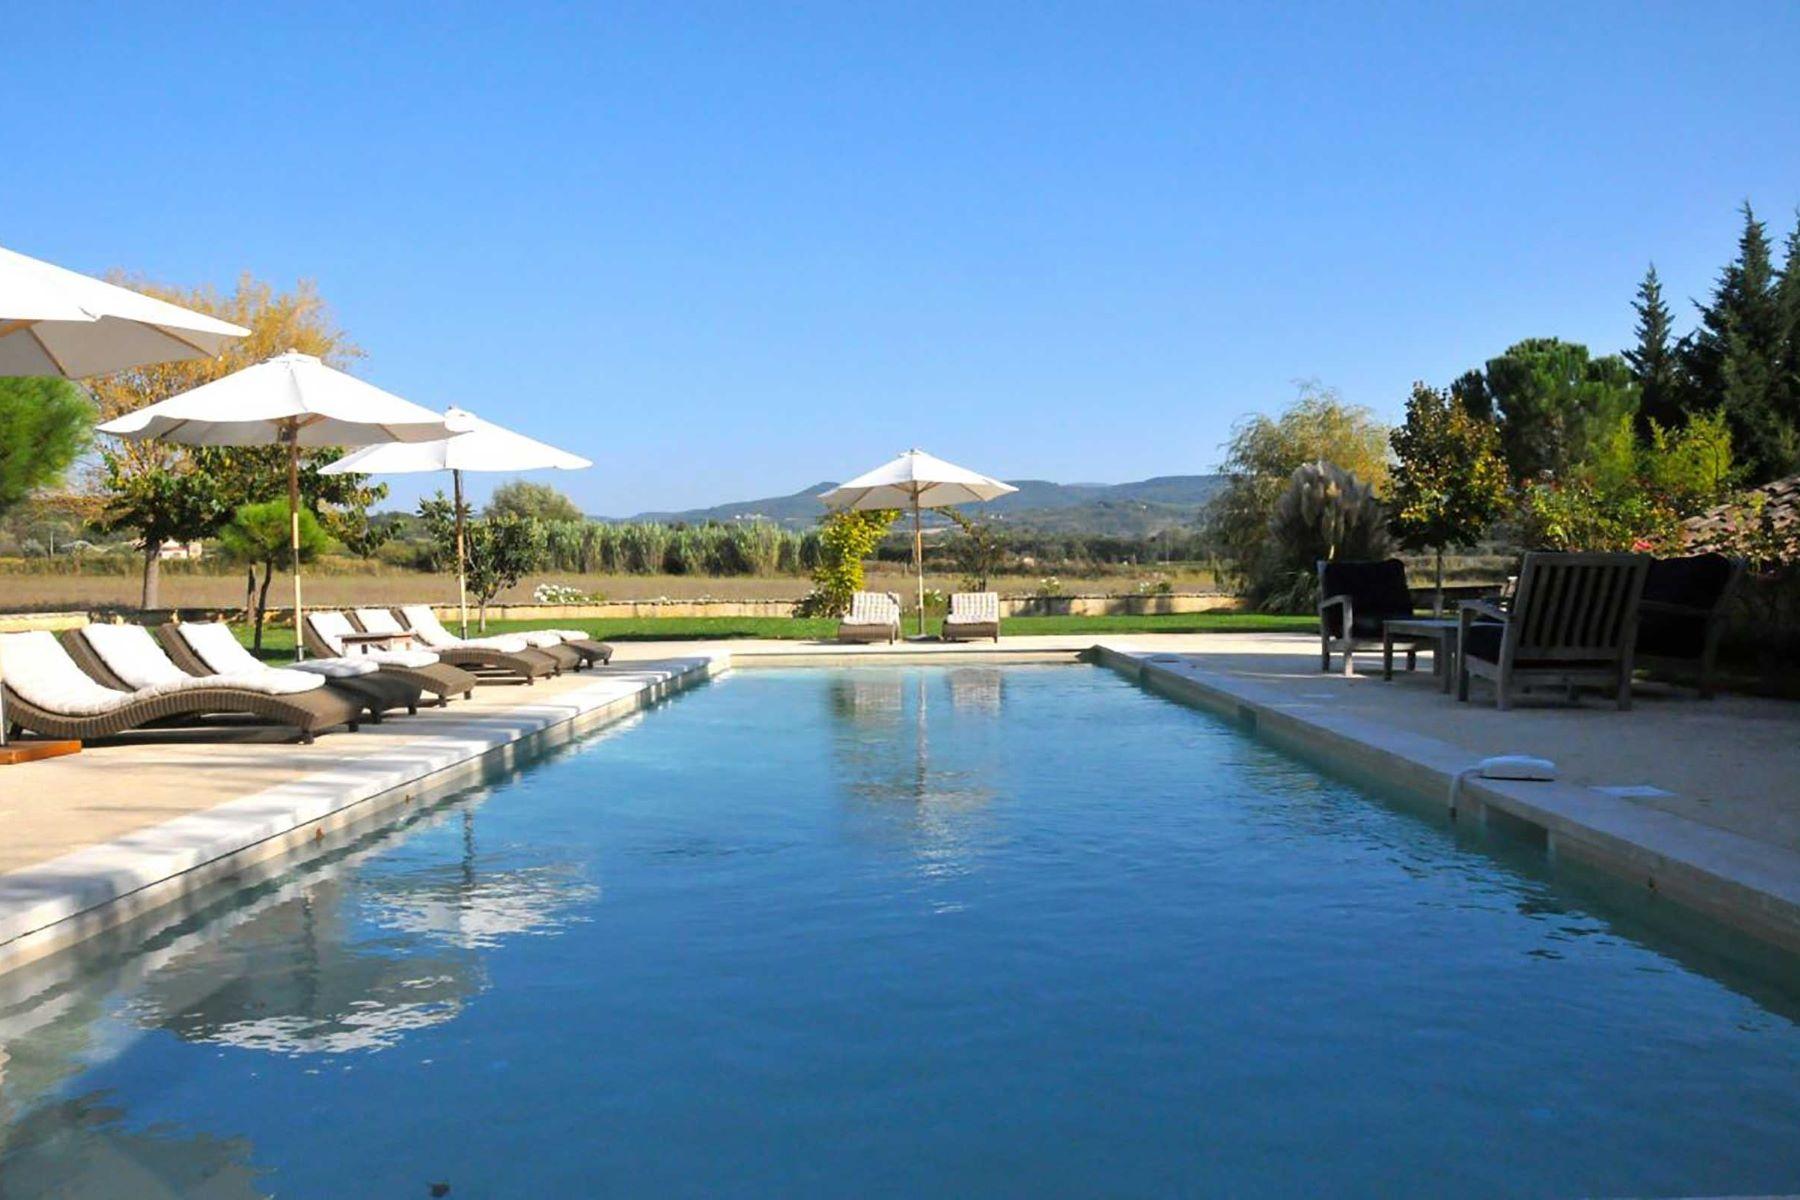 Moradia para Arrendamento às Bonnieux – Luxury Mas for rent 262m2 with 6 Bedrooms Bonnieux, Provença-Alpes-Costa Azul, 84480 França